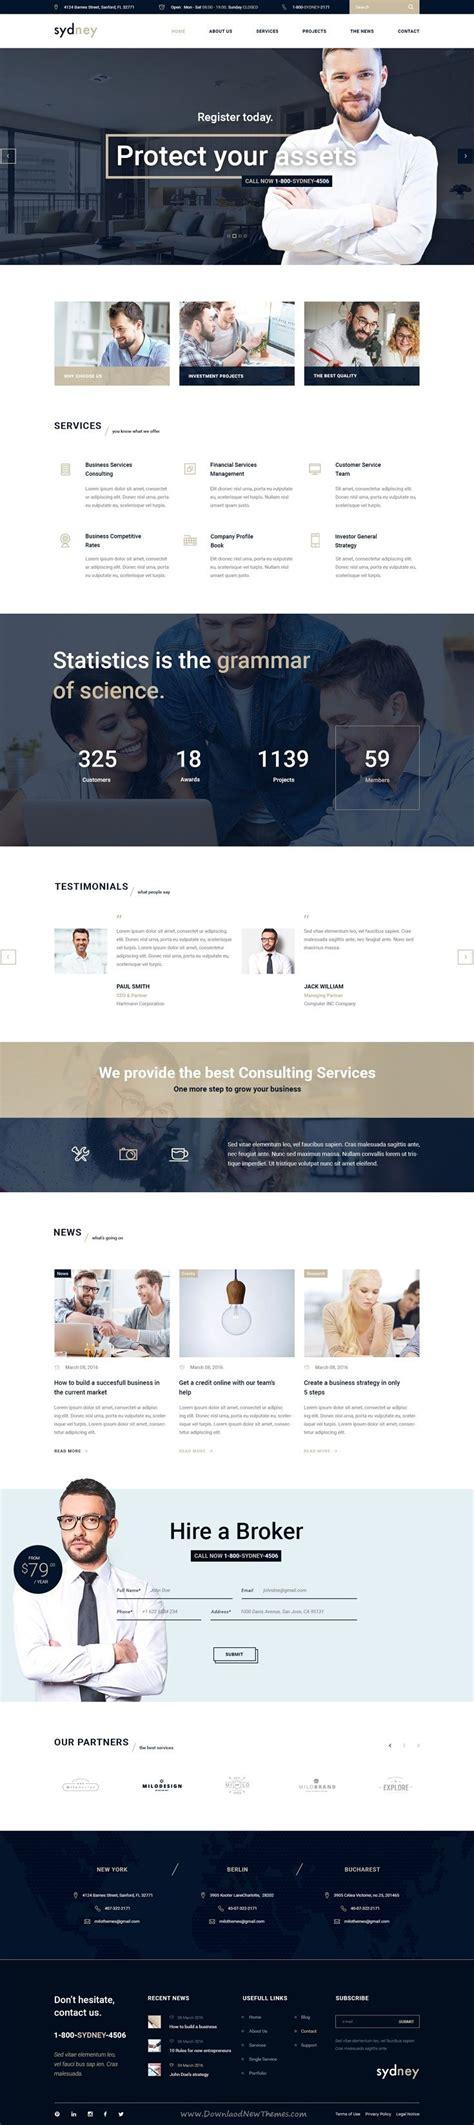 basic business website template 25 best ideas about business website on seo